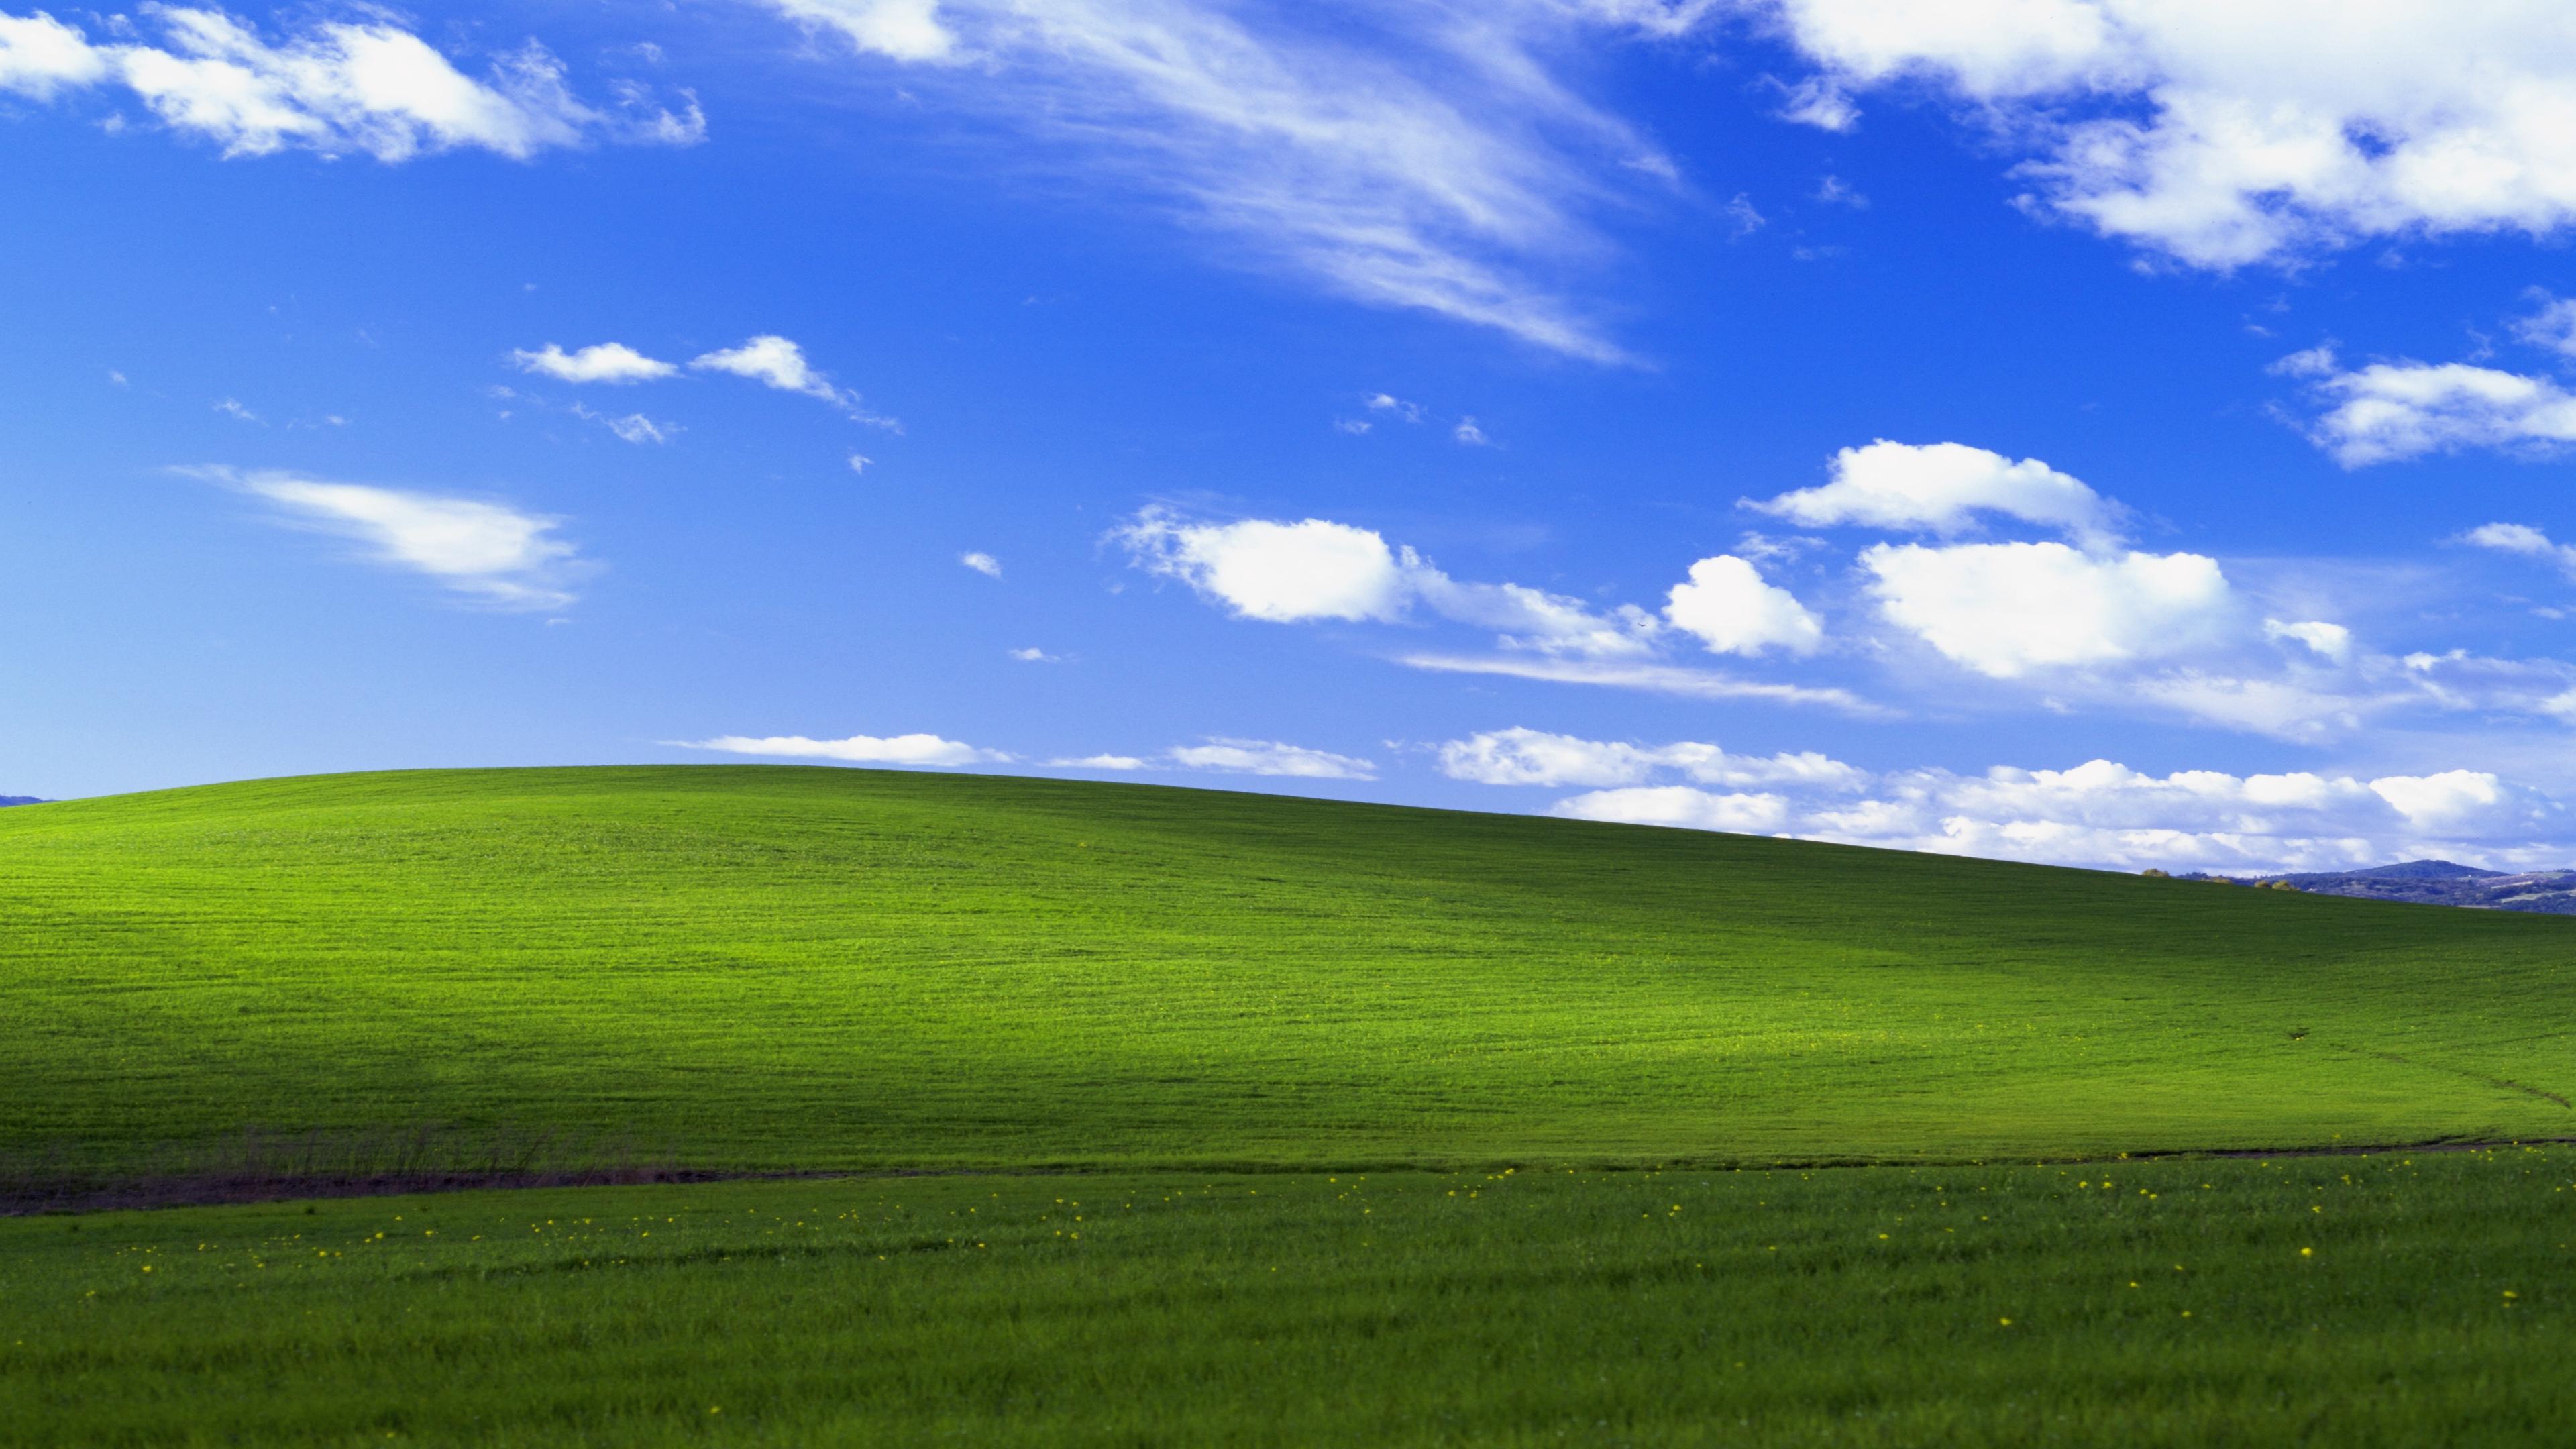 You then look at Forza Horizon 4